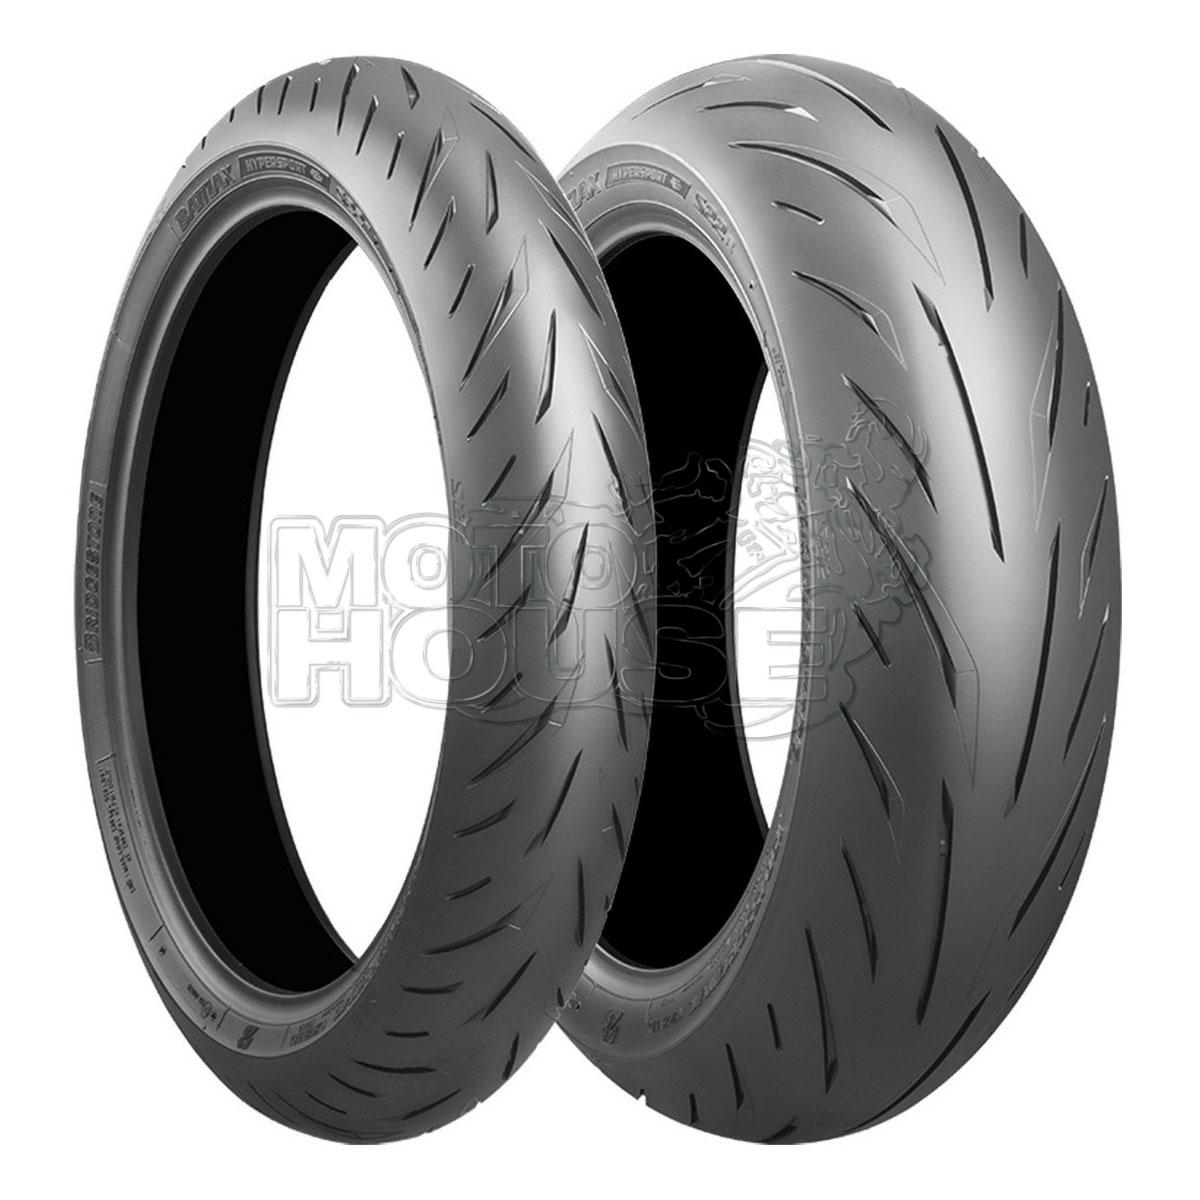 Llanta P/ Motocicleta Bridgestone Battlax S22 180/55-17 73w